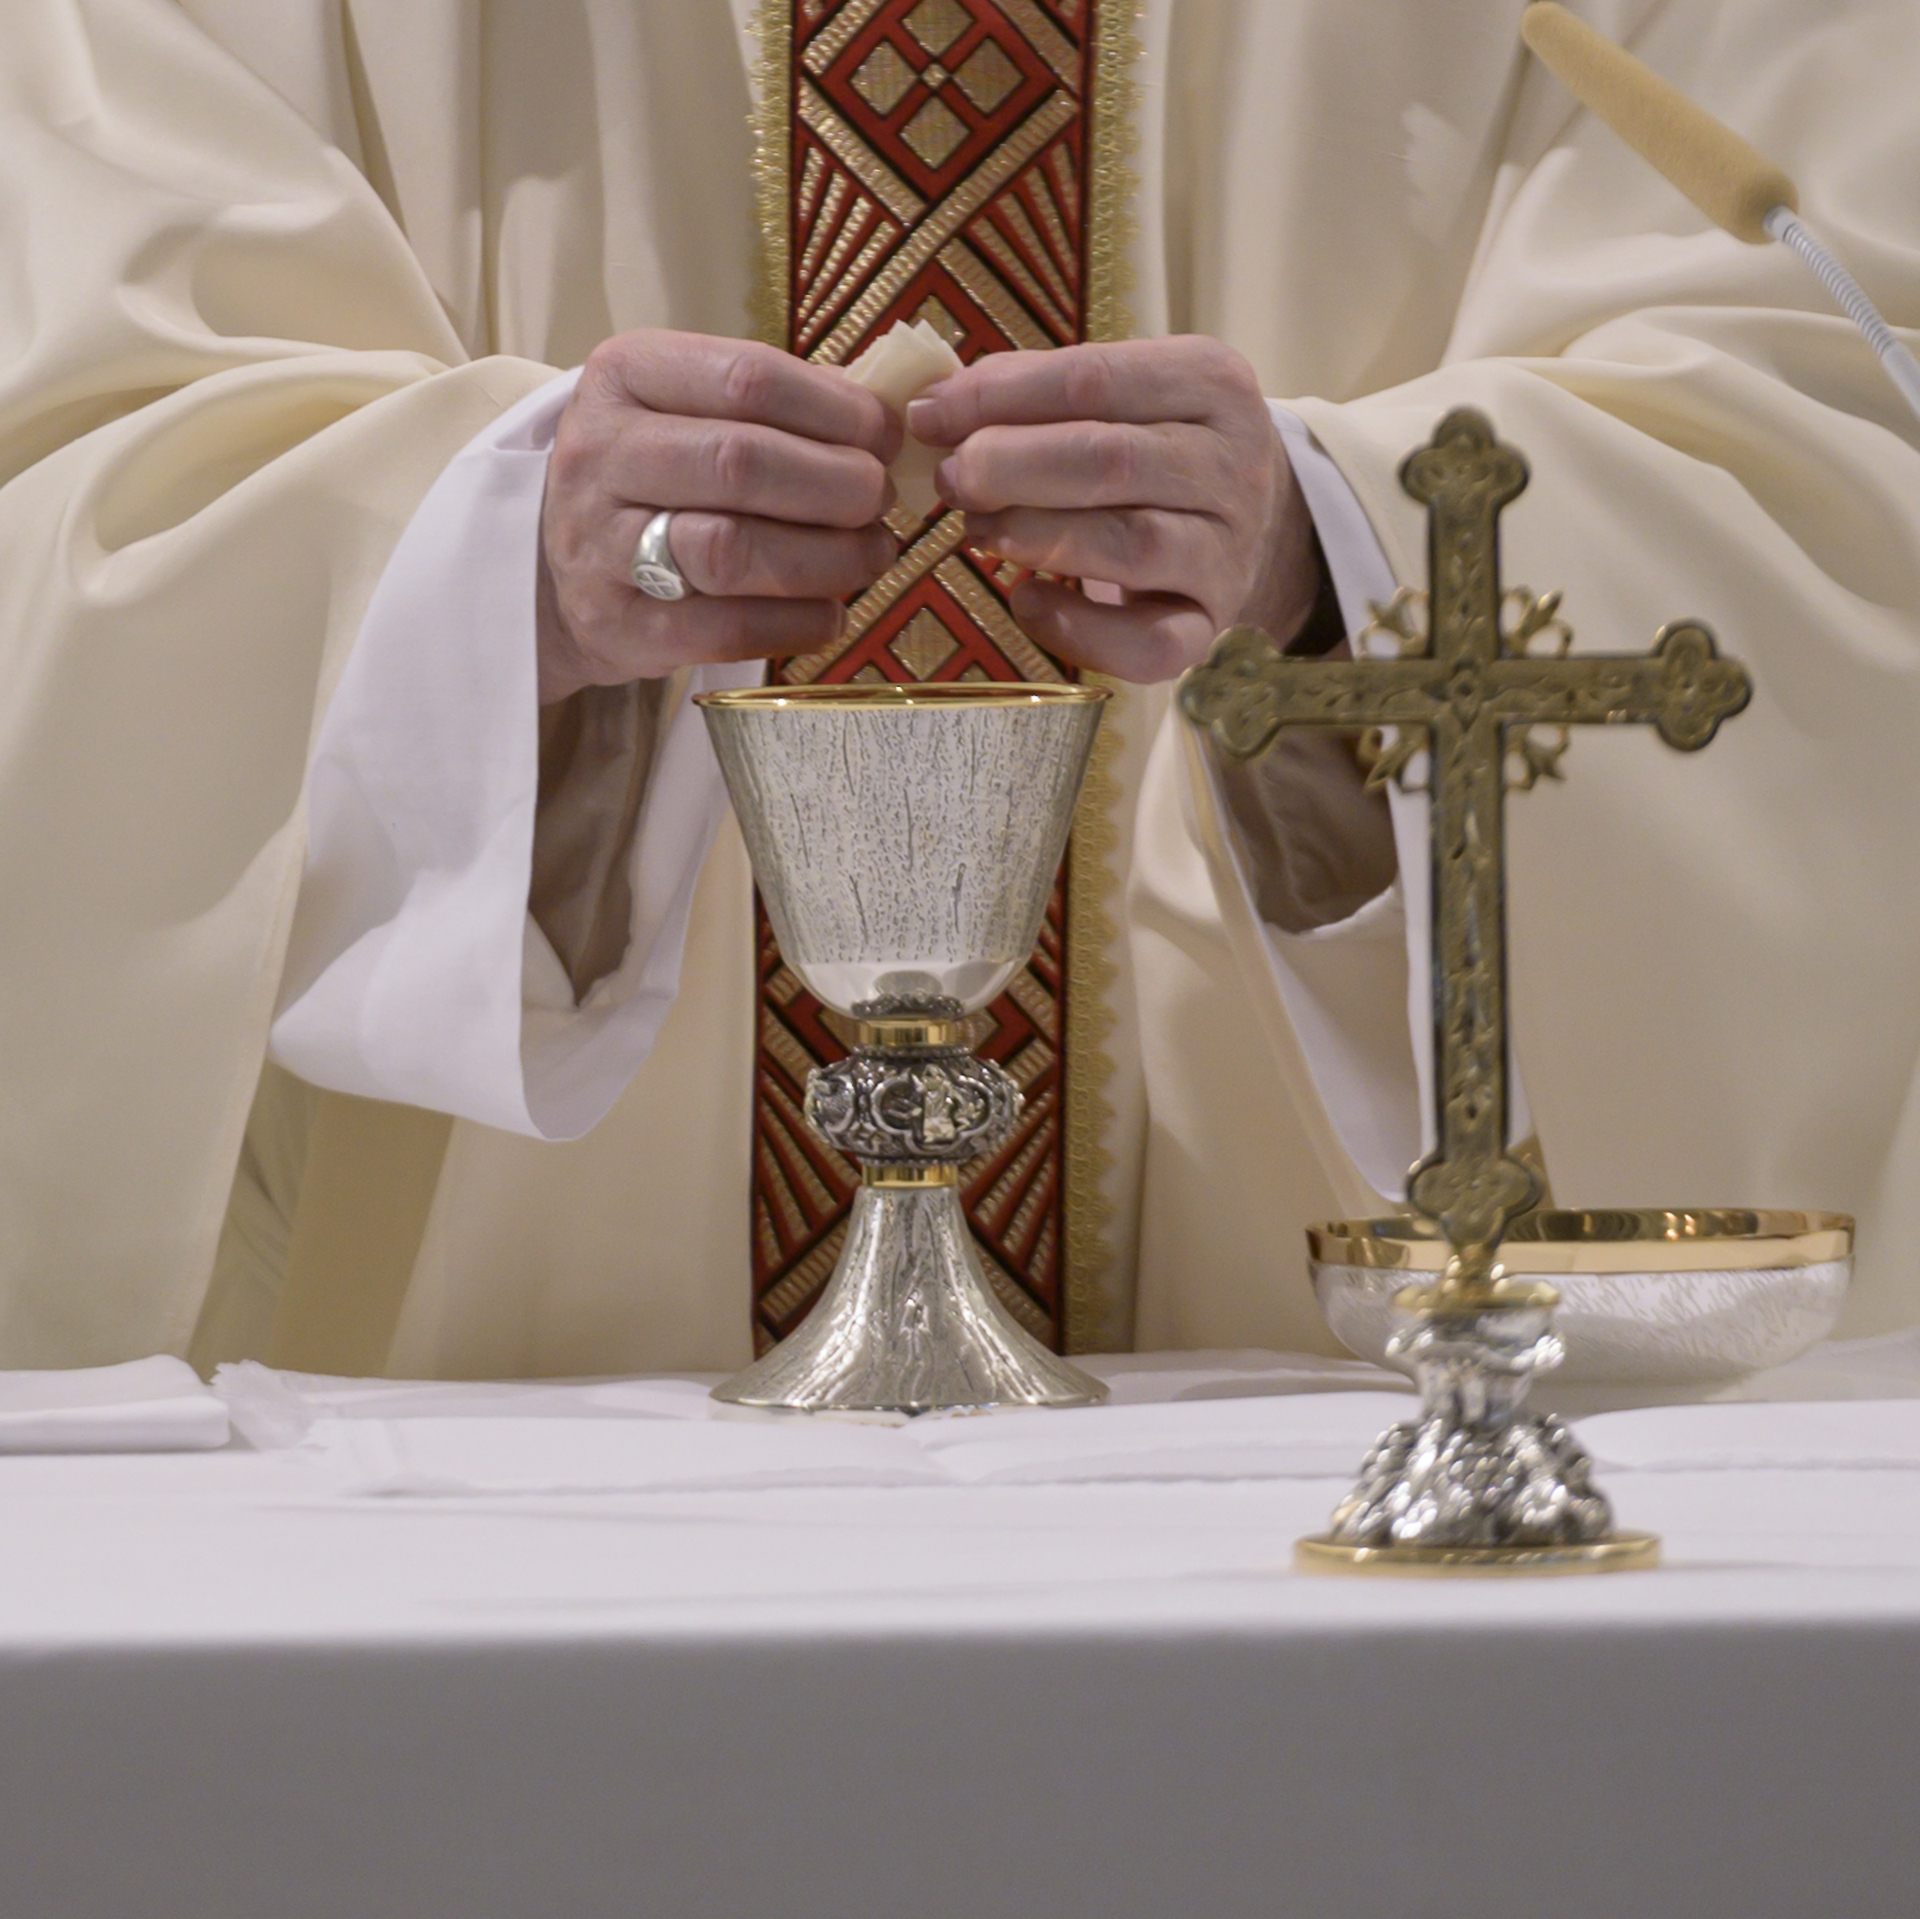 Messe à Sainte-Marthe, 28 avril 2020 © Vatican Media